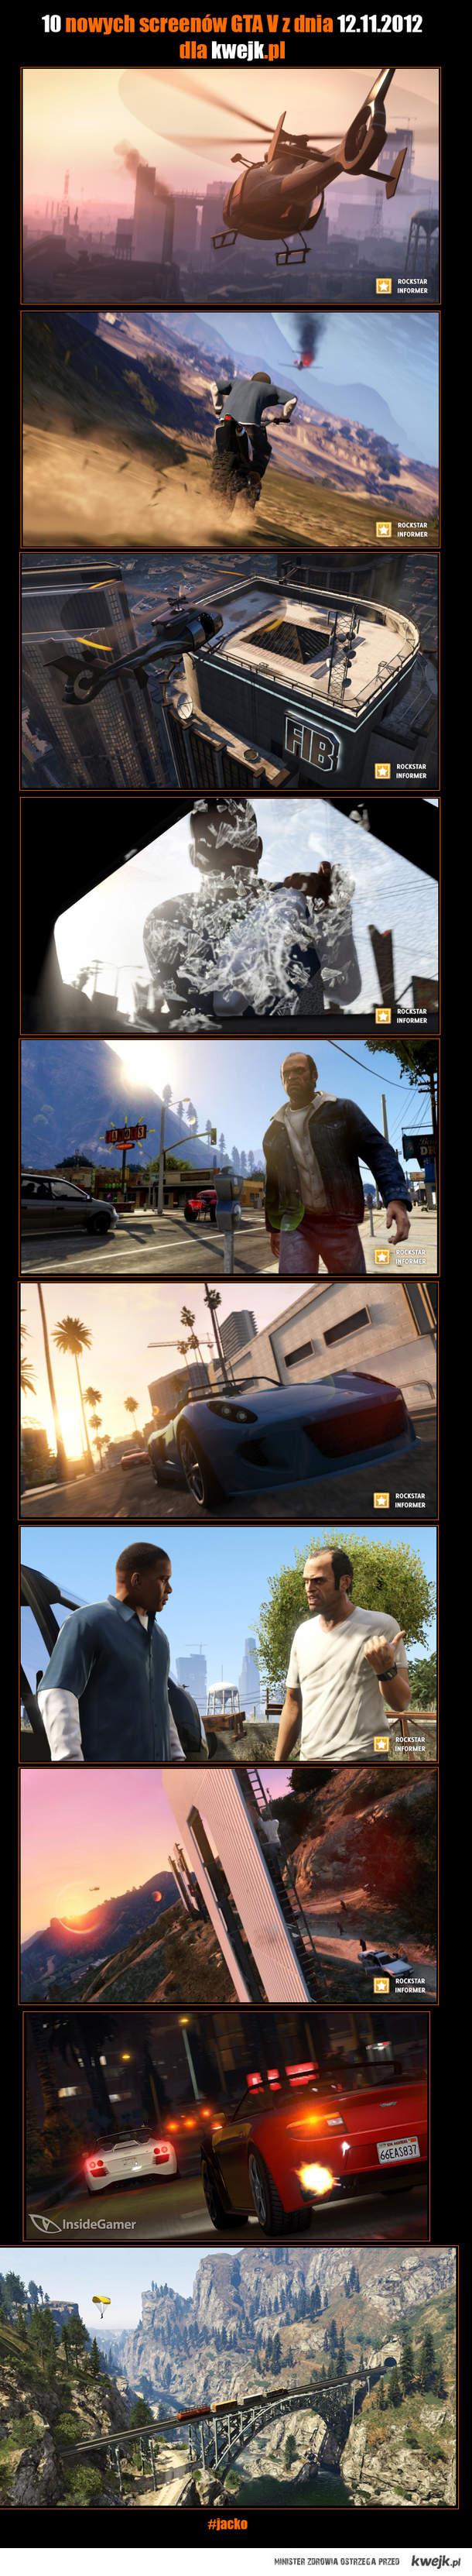 GTA V - nowe screeny